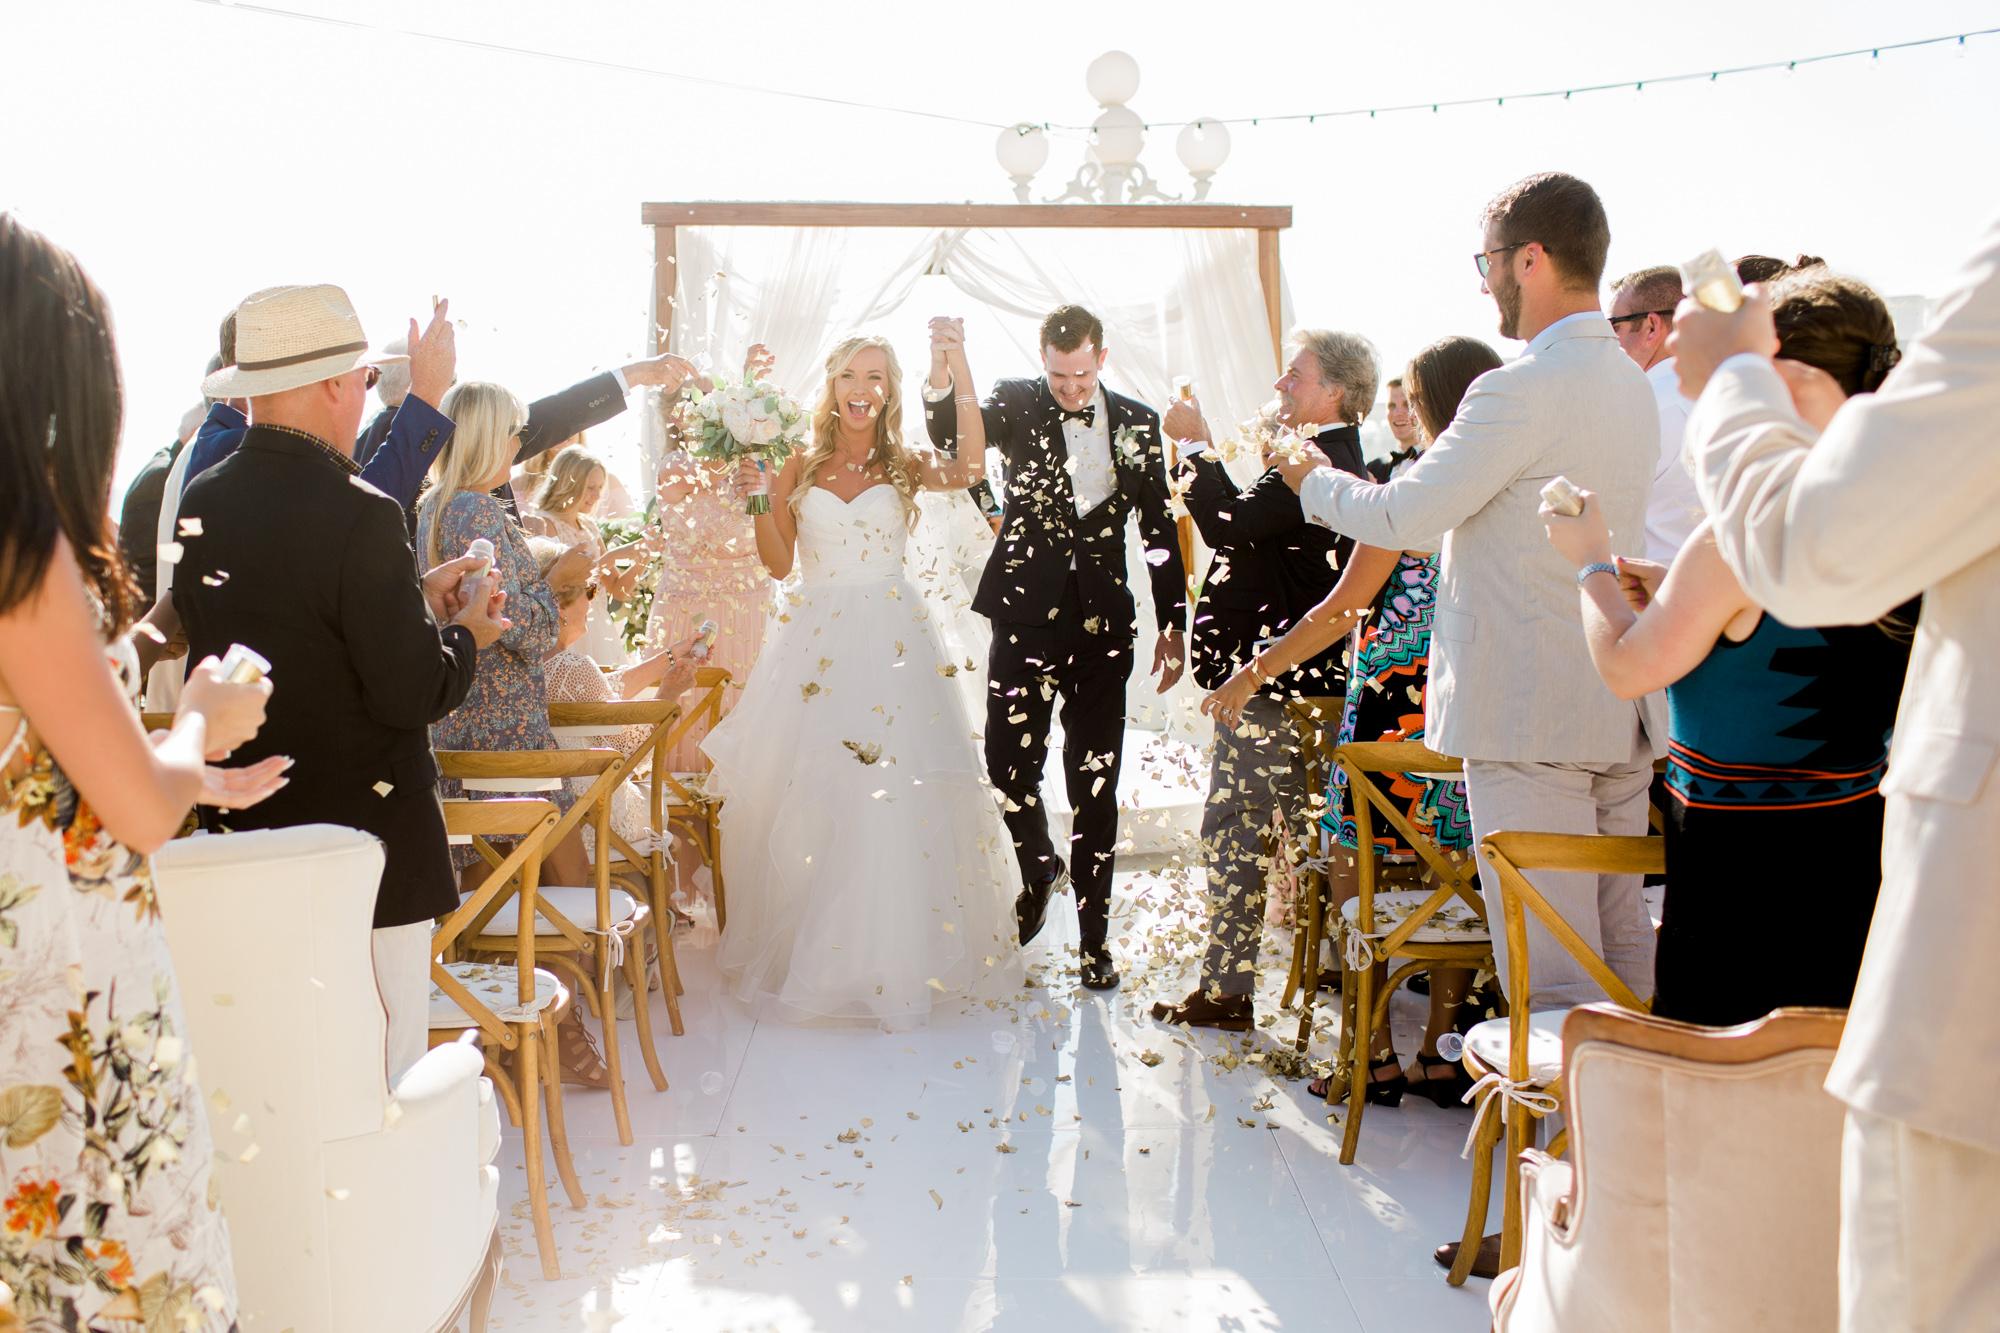 Orange_County_Laguna_Beach_Wedding_Ceremony_Hair_Makeup_7.jpg